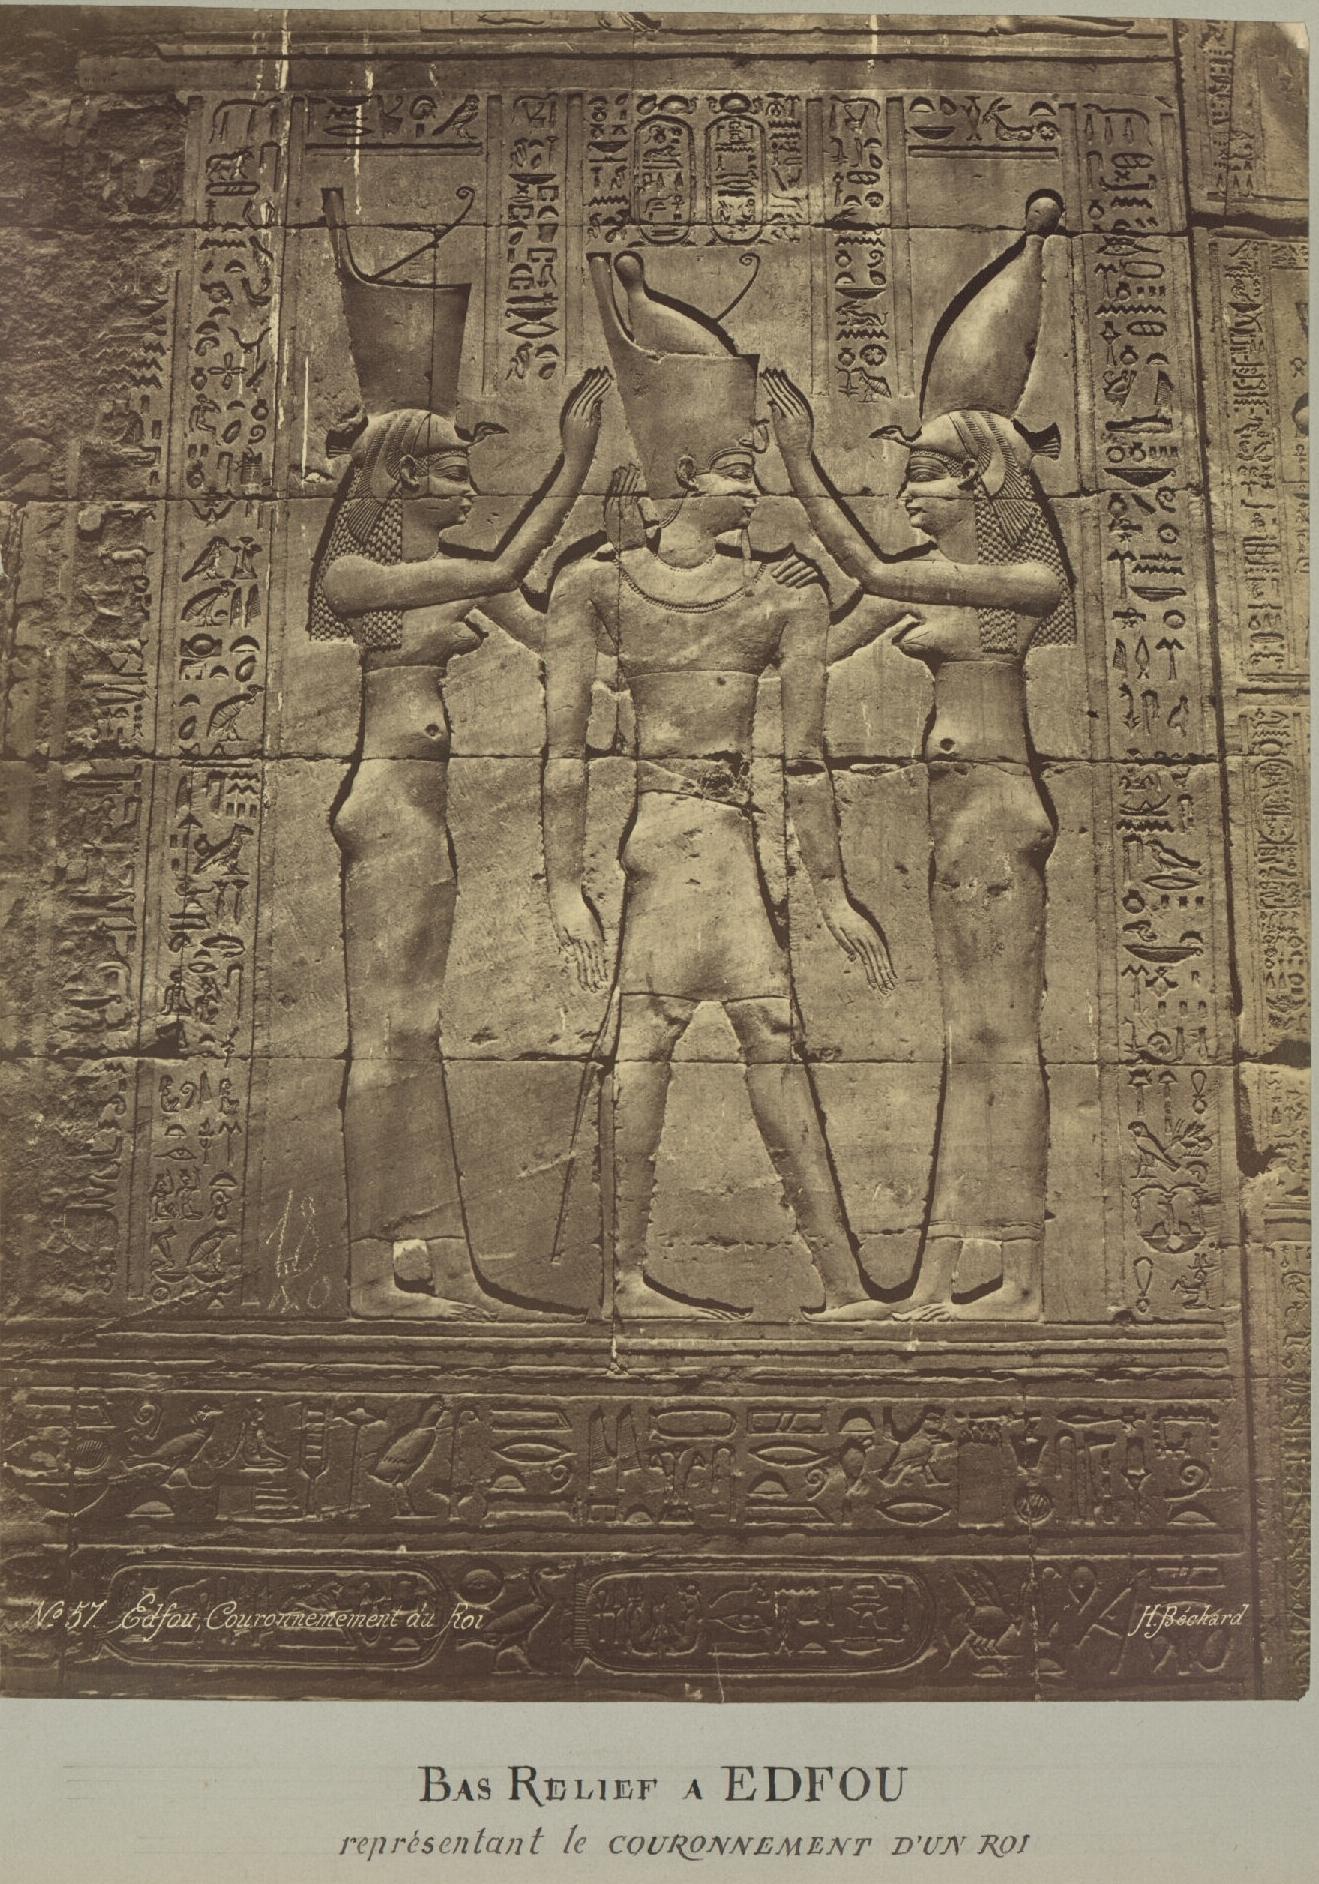 Эдфу. Барельеф, представляющий церемонию коронации фараона Птолемея VIII